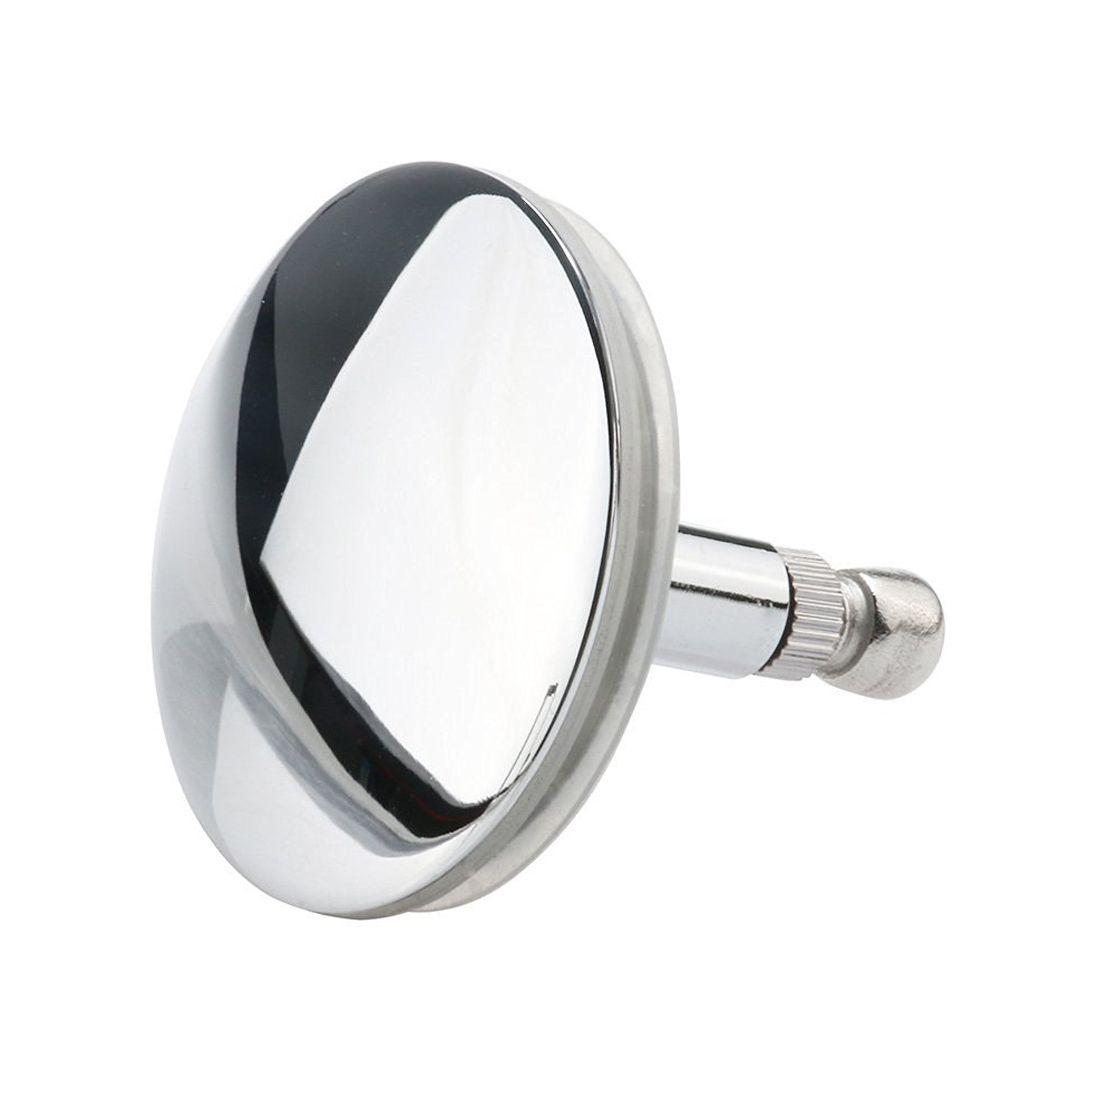 CNIM Hot Badewanne Becken Drain Stopper Stecker Bad Bad Stecker Badewanne Abfluss Silber